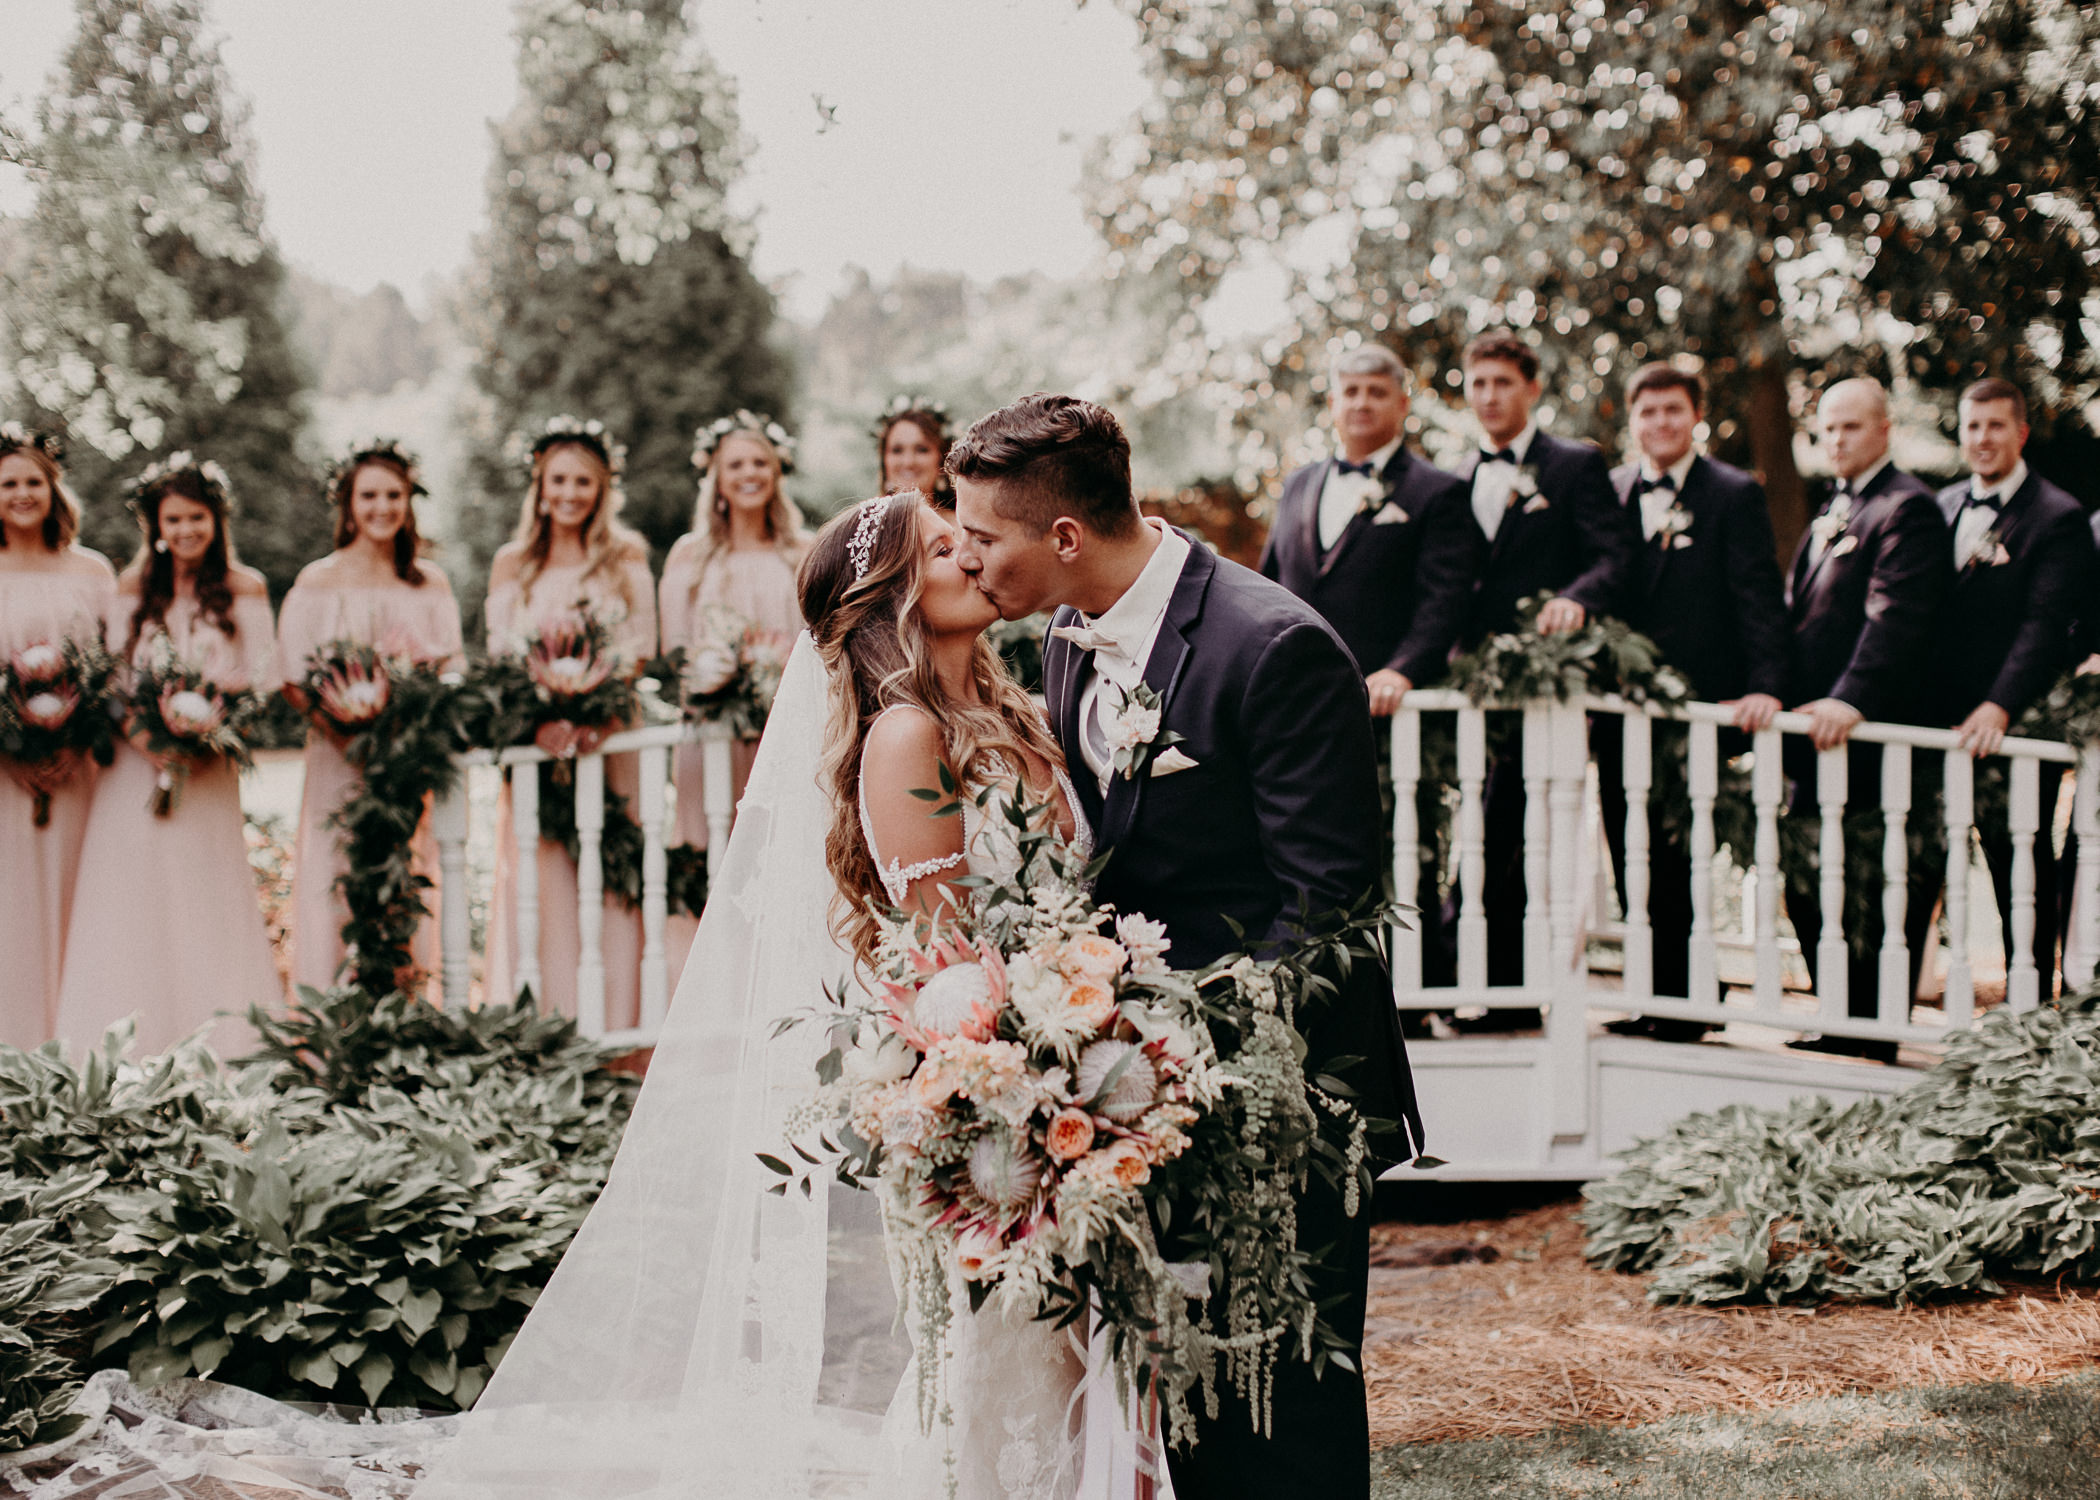 48Carl House Wedding Venue Ga, Atlanta Wedding Photographer - Boho, Bohemian, Junebug Weddings, Vintage, Retro, Trendy. Aline Marin Photography. .jpg